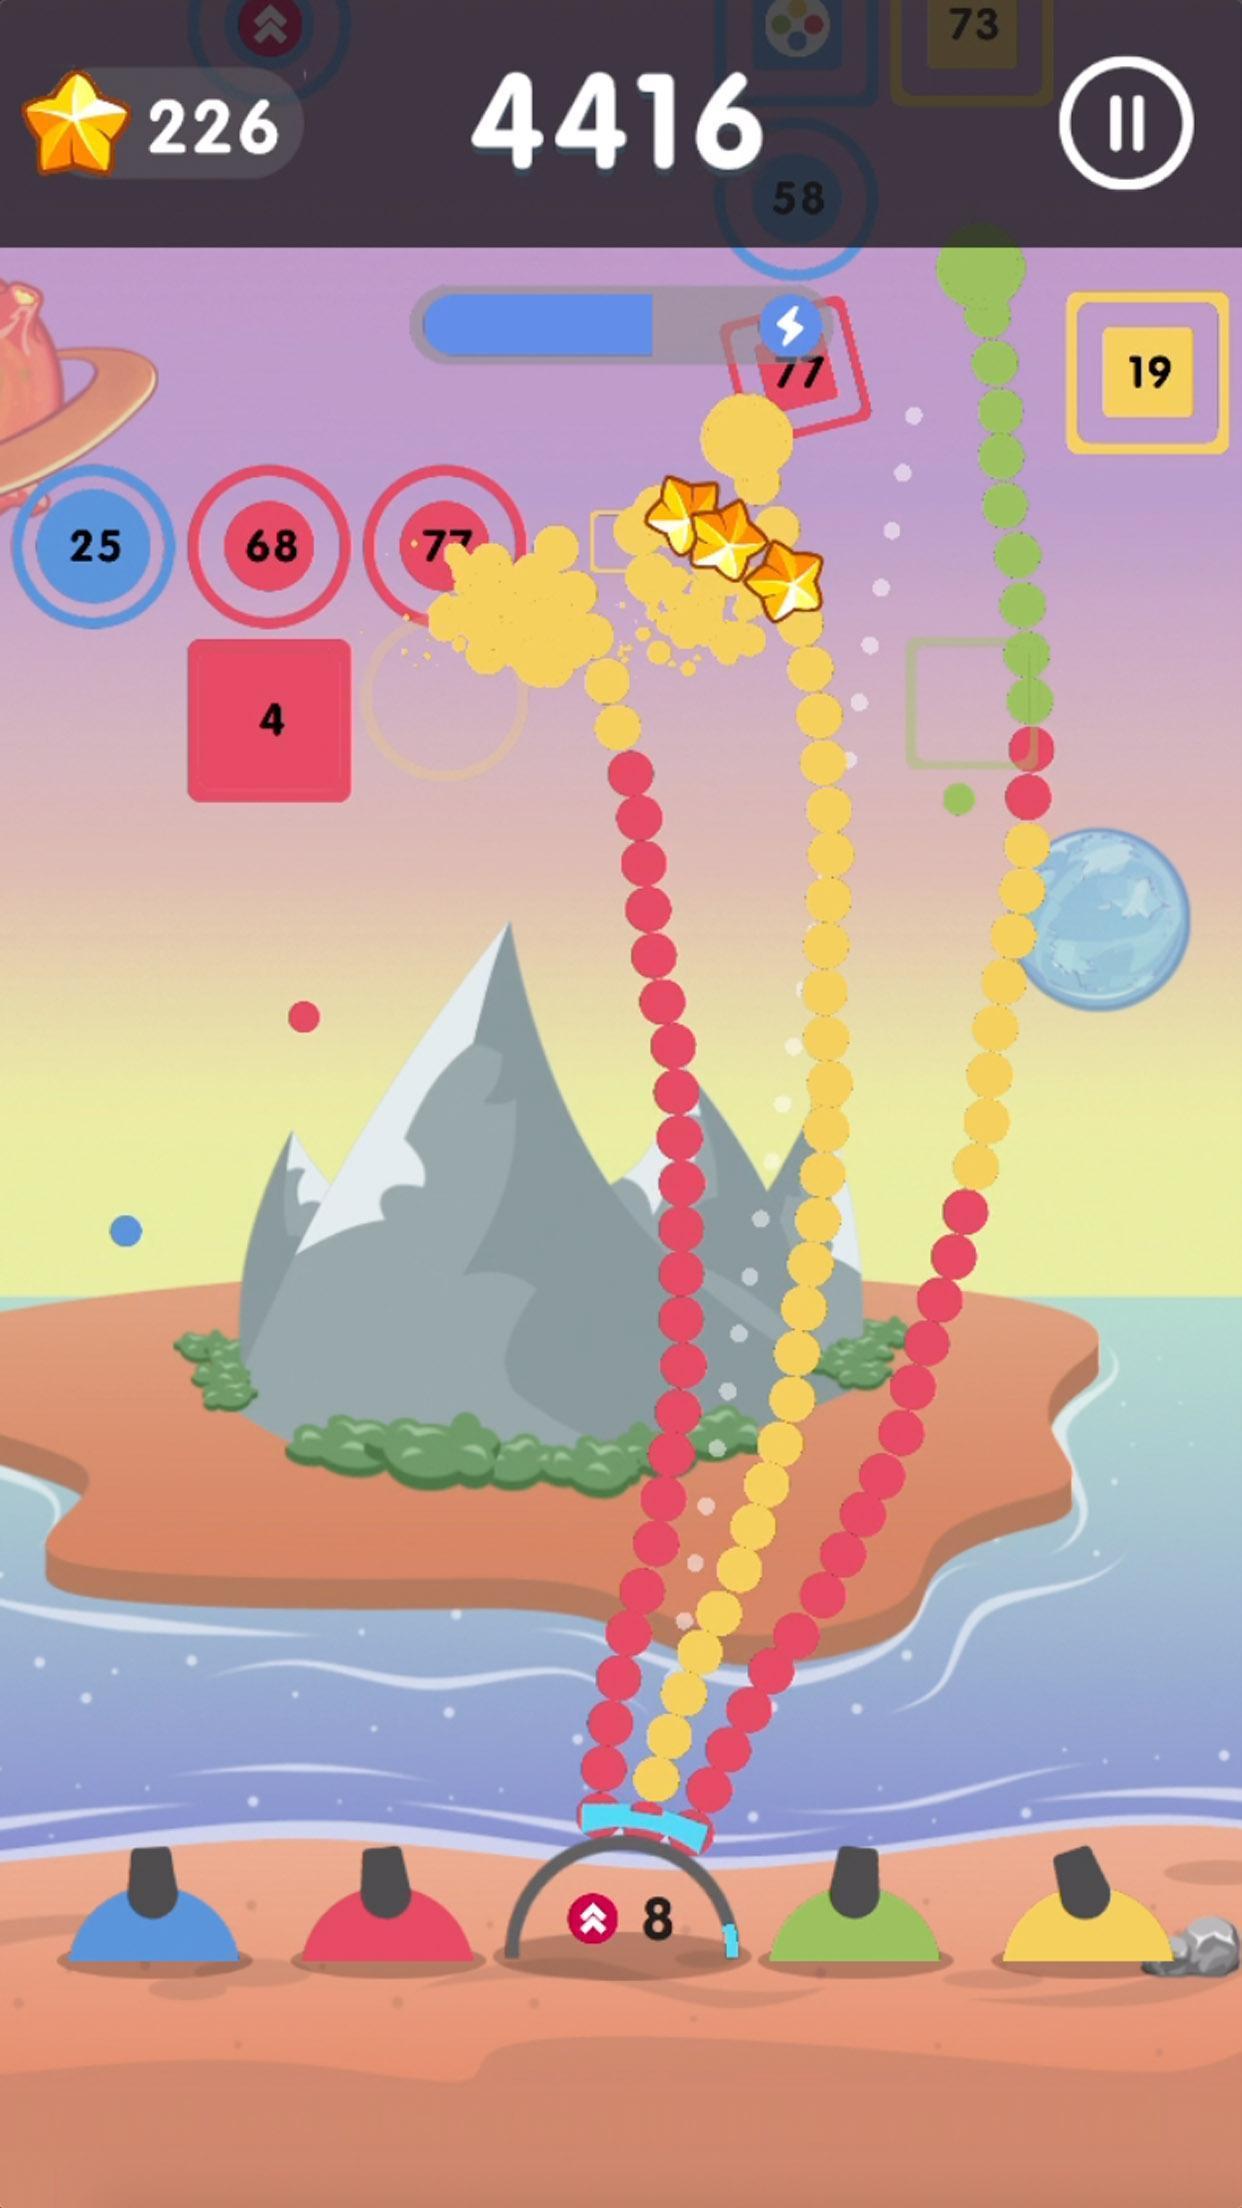 Bubbles Cannon 1.5.5 Screenshot 4